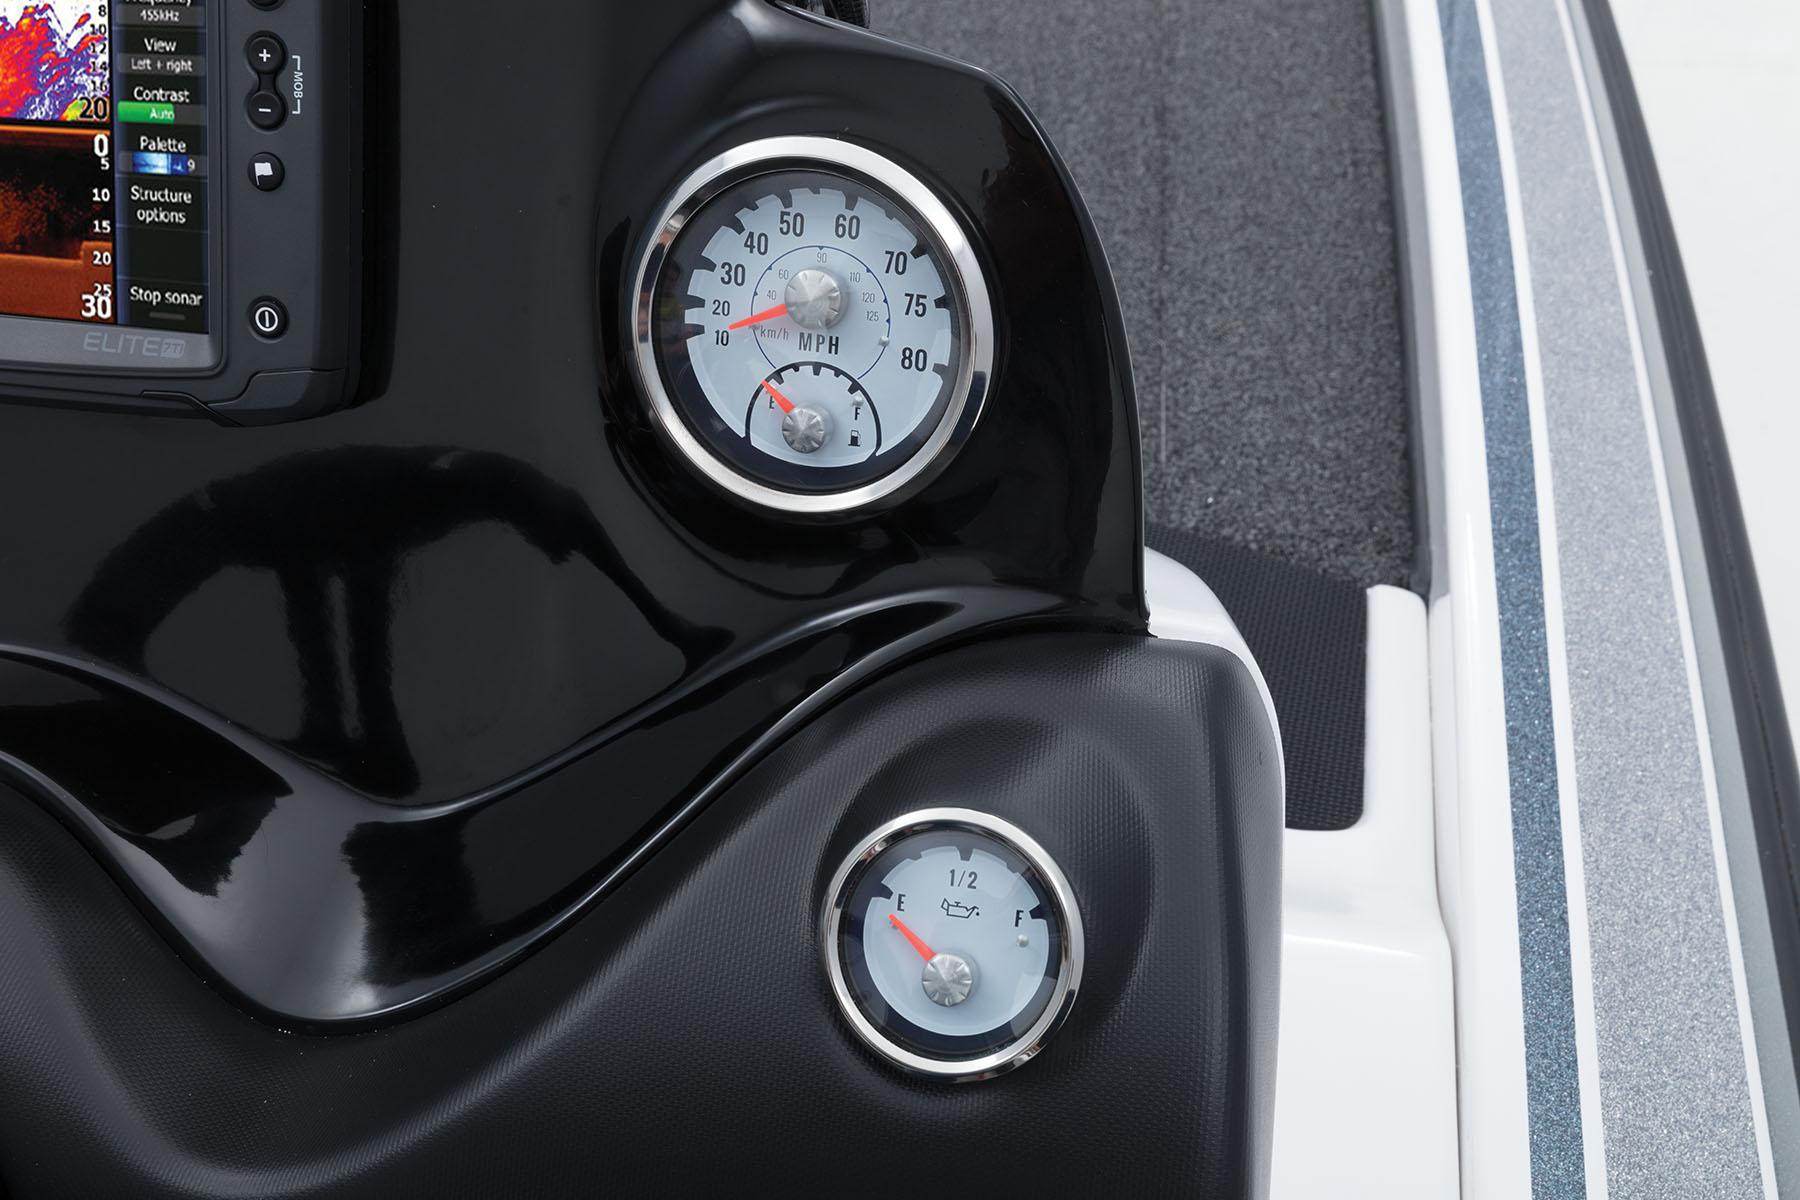 2018 Nitro Z21 Bass Boat Mercury Smartcraft Speedometer Gps Wiring Veethree Multifunction Instrumentation W Fuel Gauge Tach Trim Water Pressure Oil Level Indicator